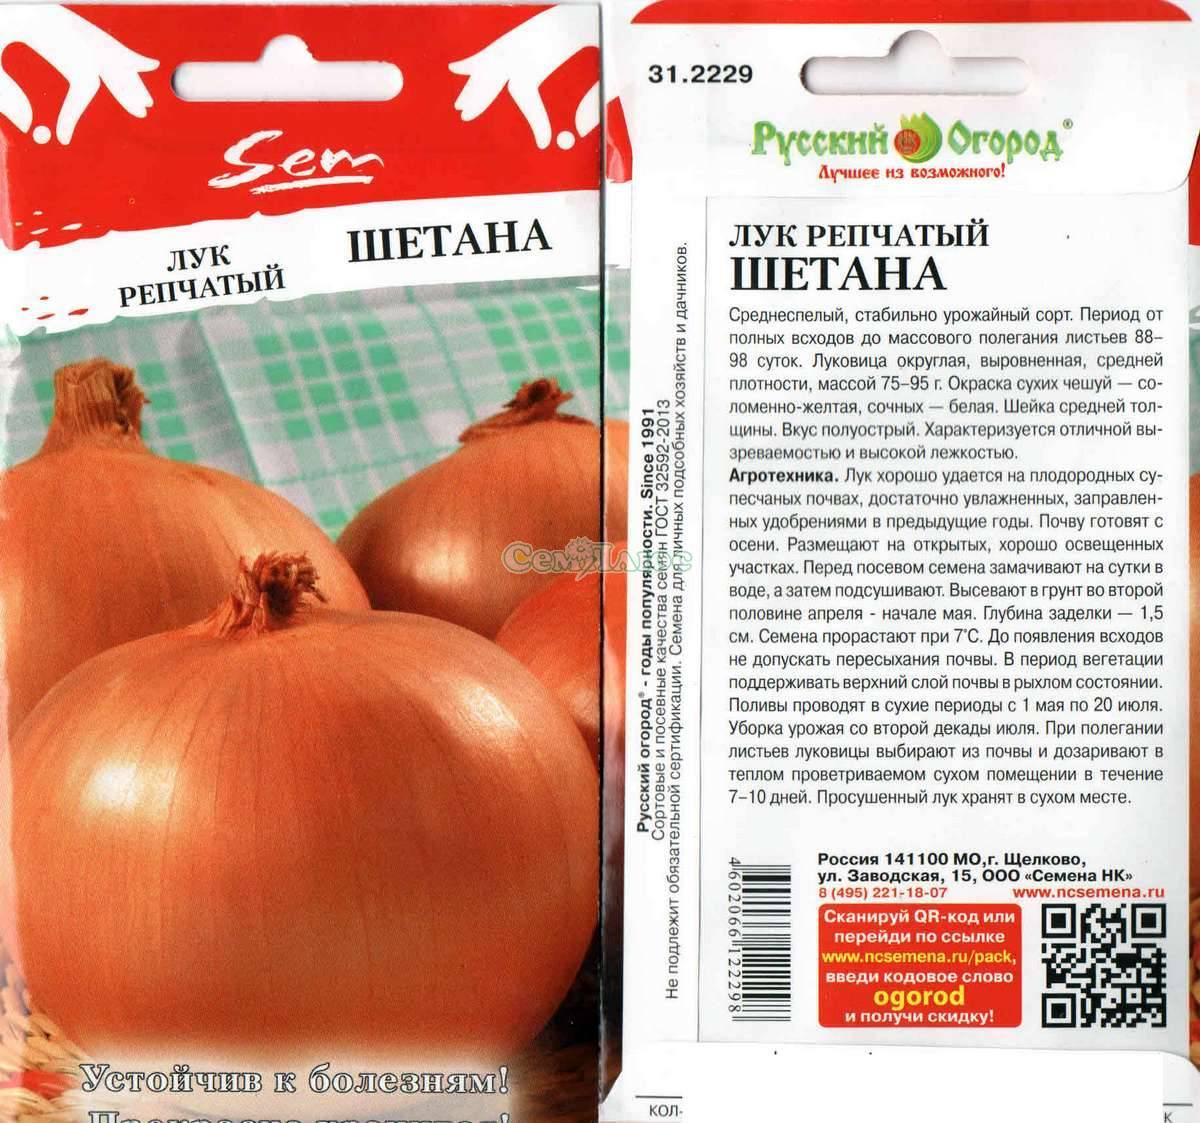 Описание и характеристики сорта лука Шетана и рекомендации по выращиванию